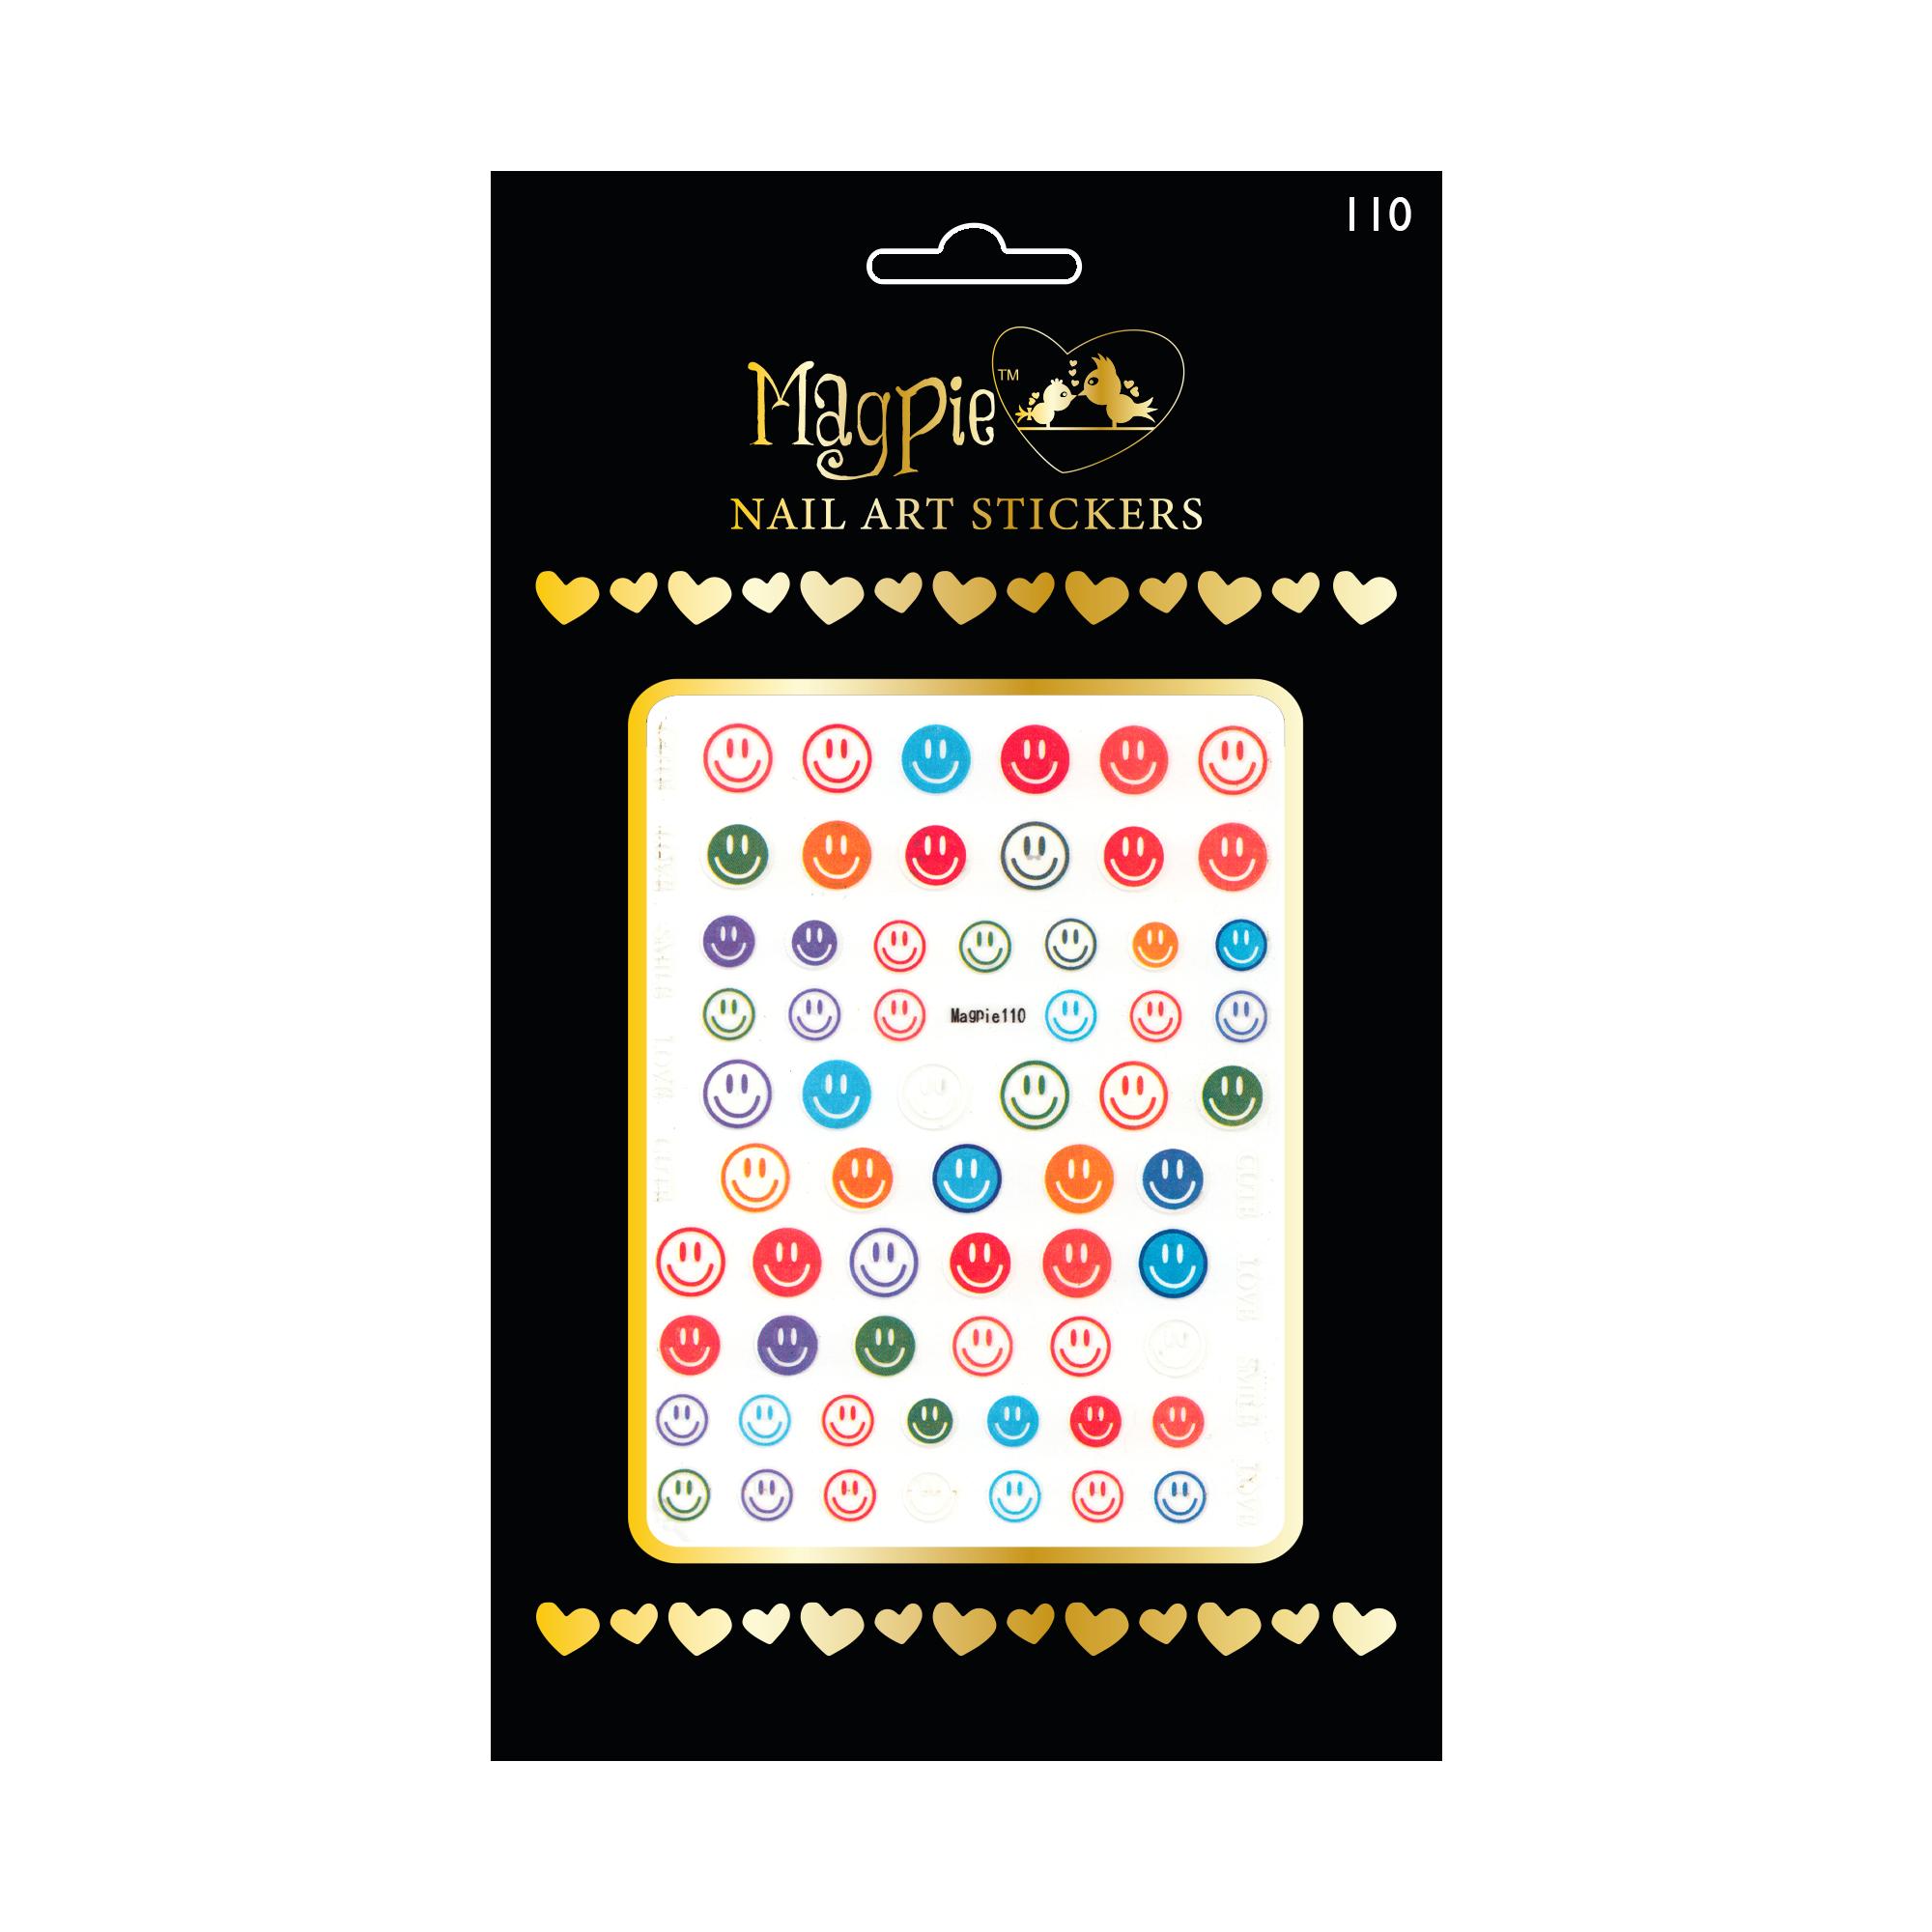 Magpie 110 stickers